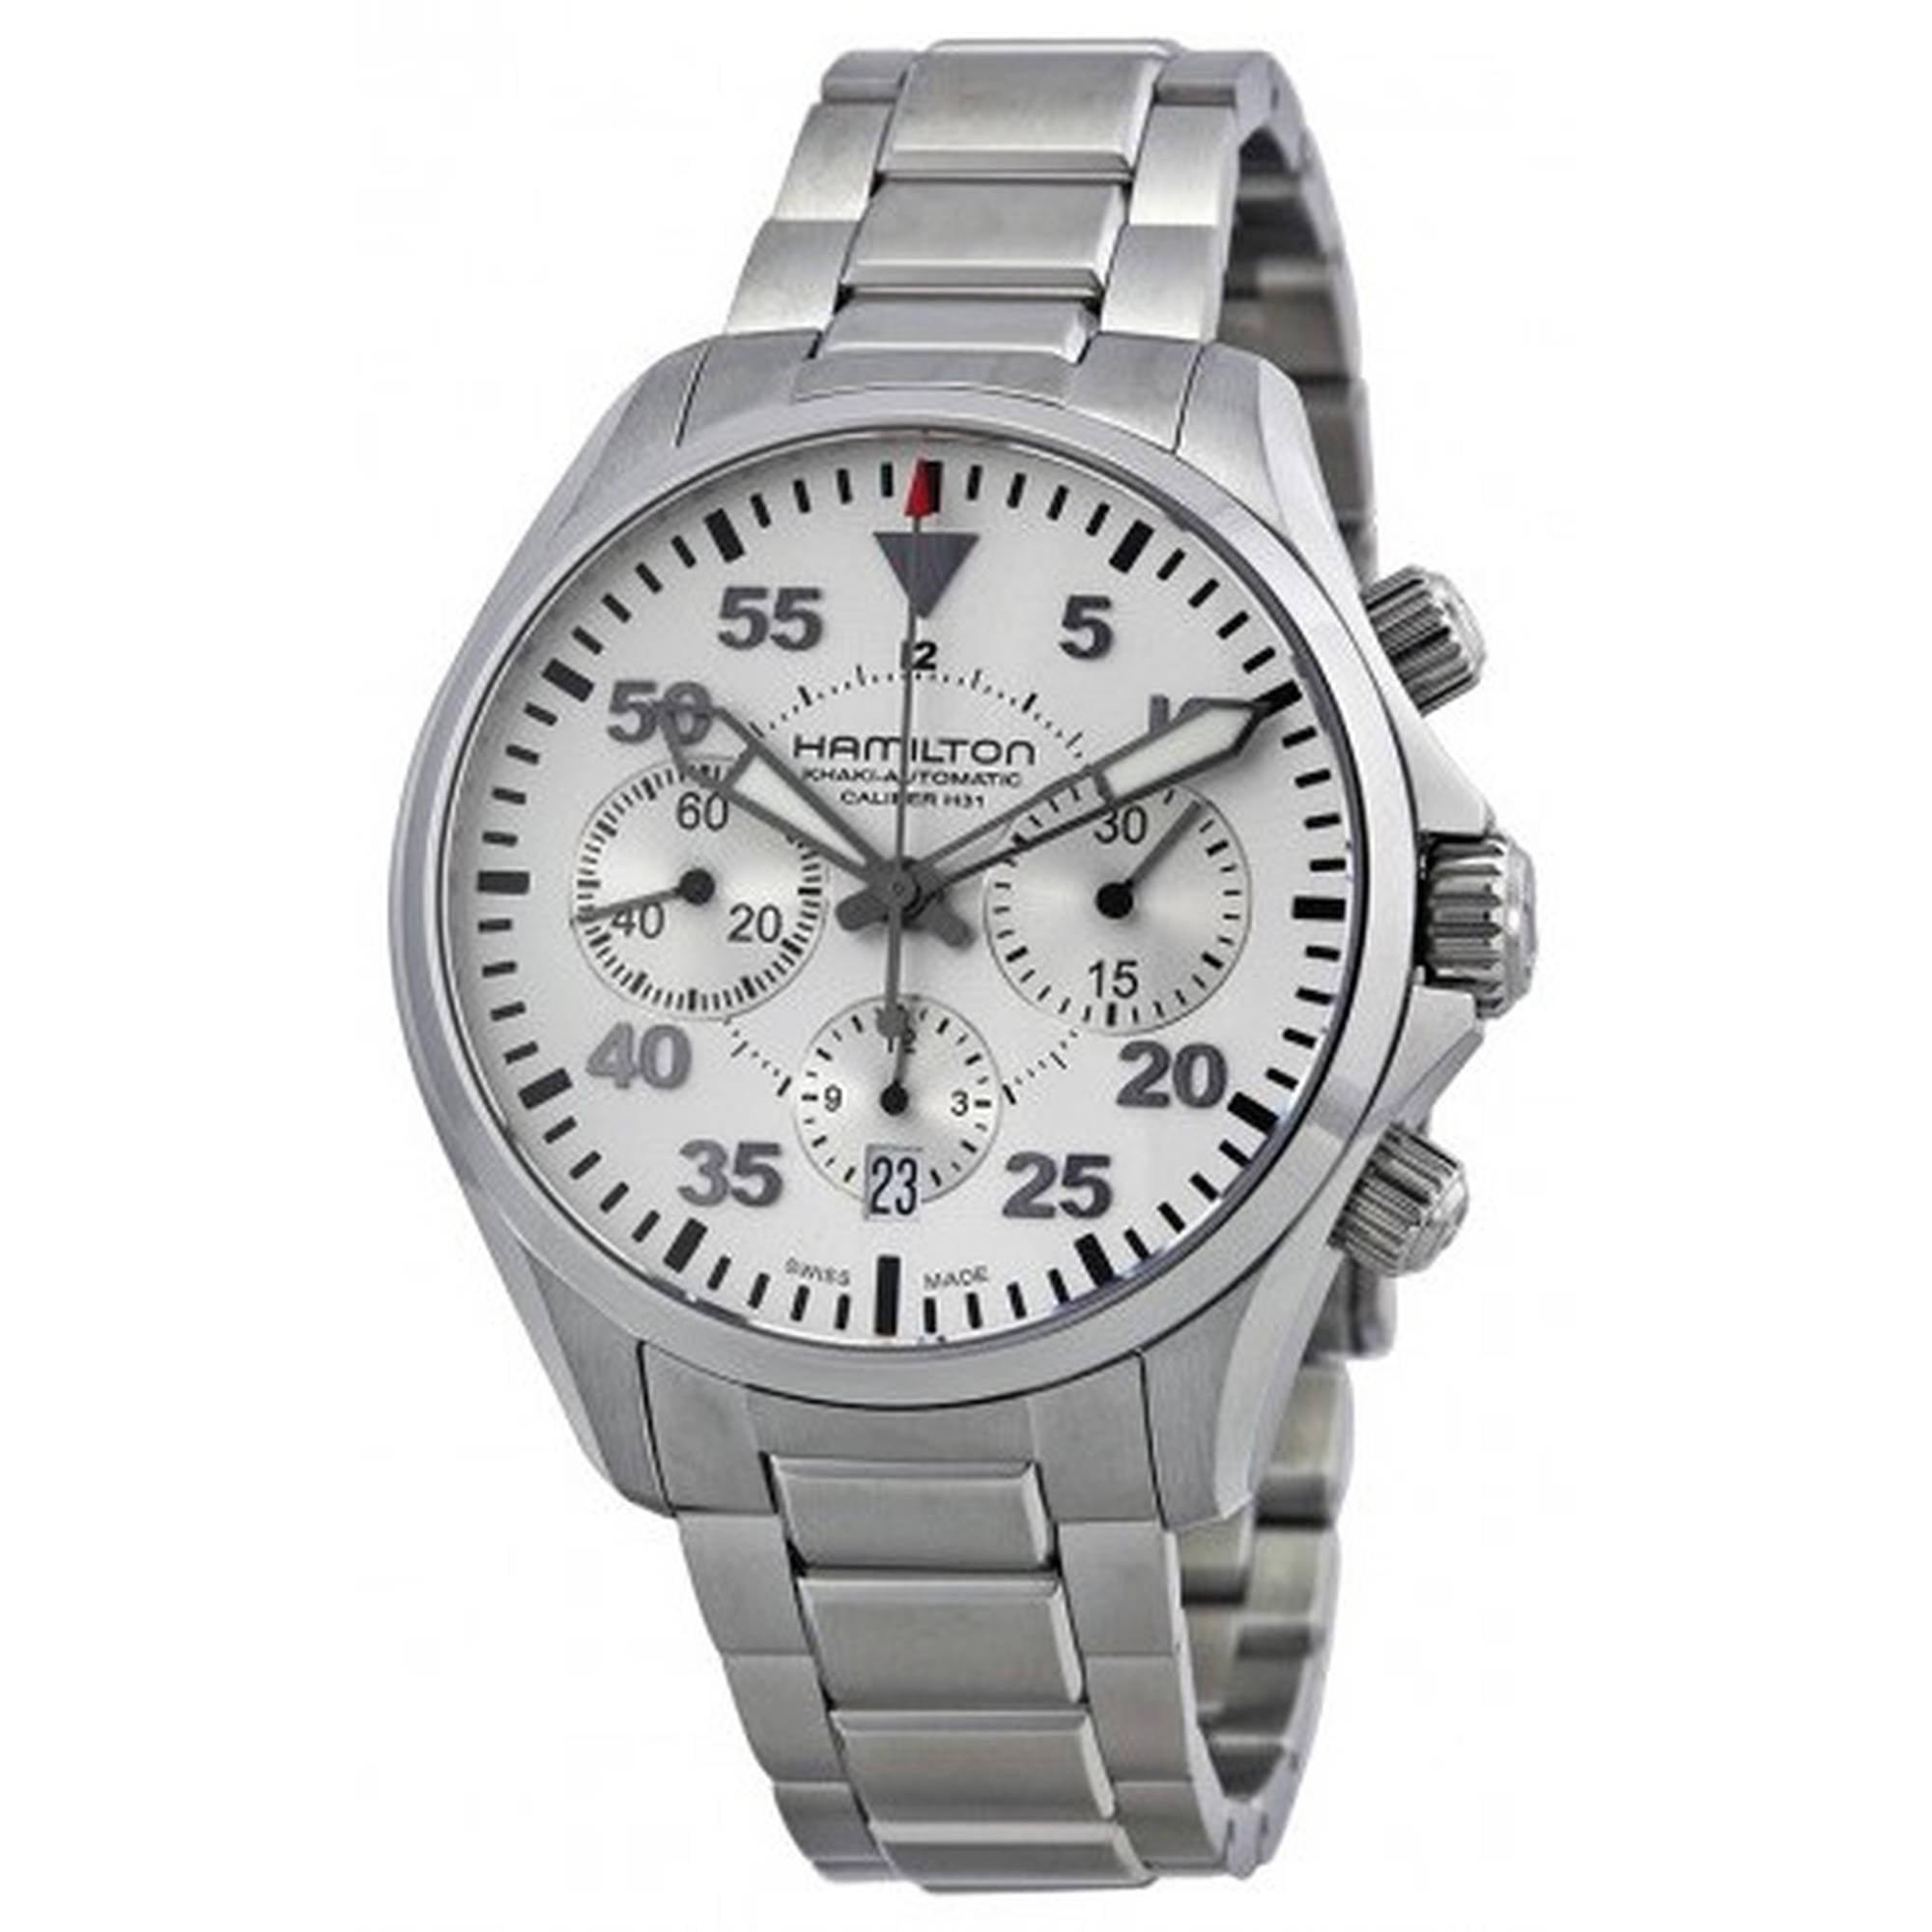 Hamilton Khaki Pilot Automatic Chronograph Mens Watch H64666155 by Hamilton